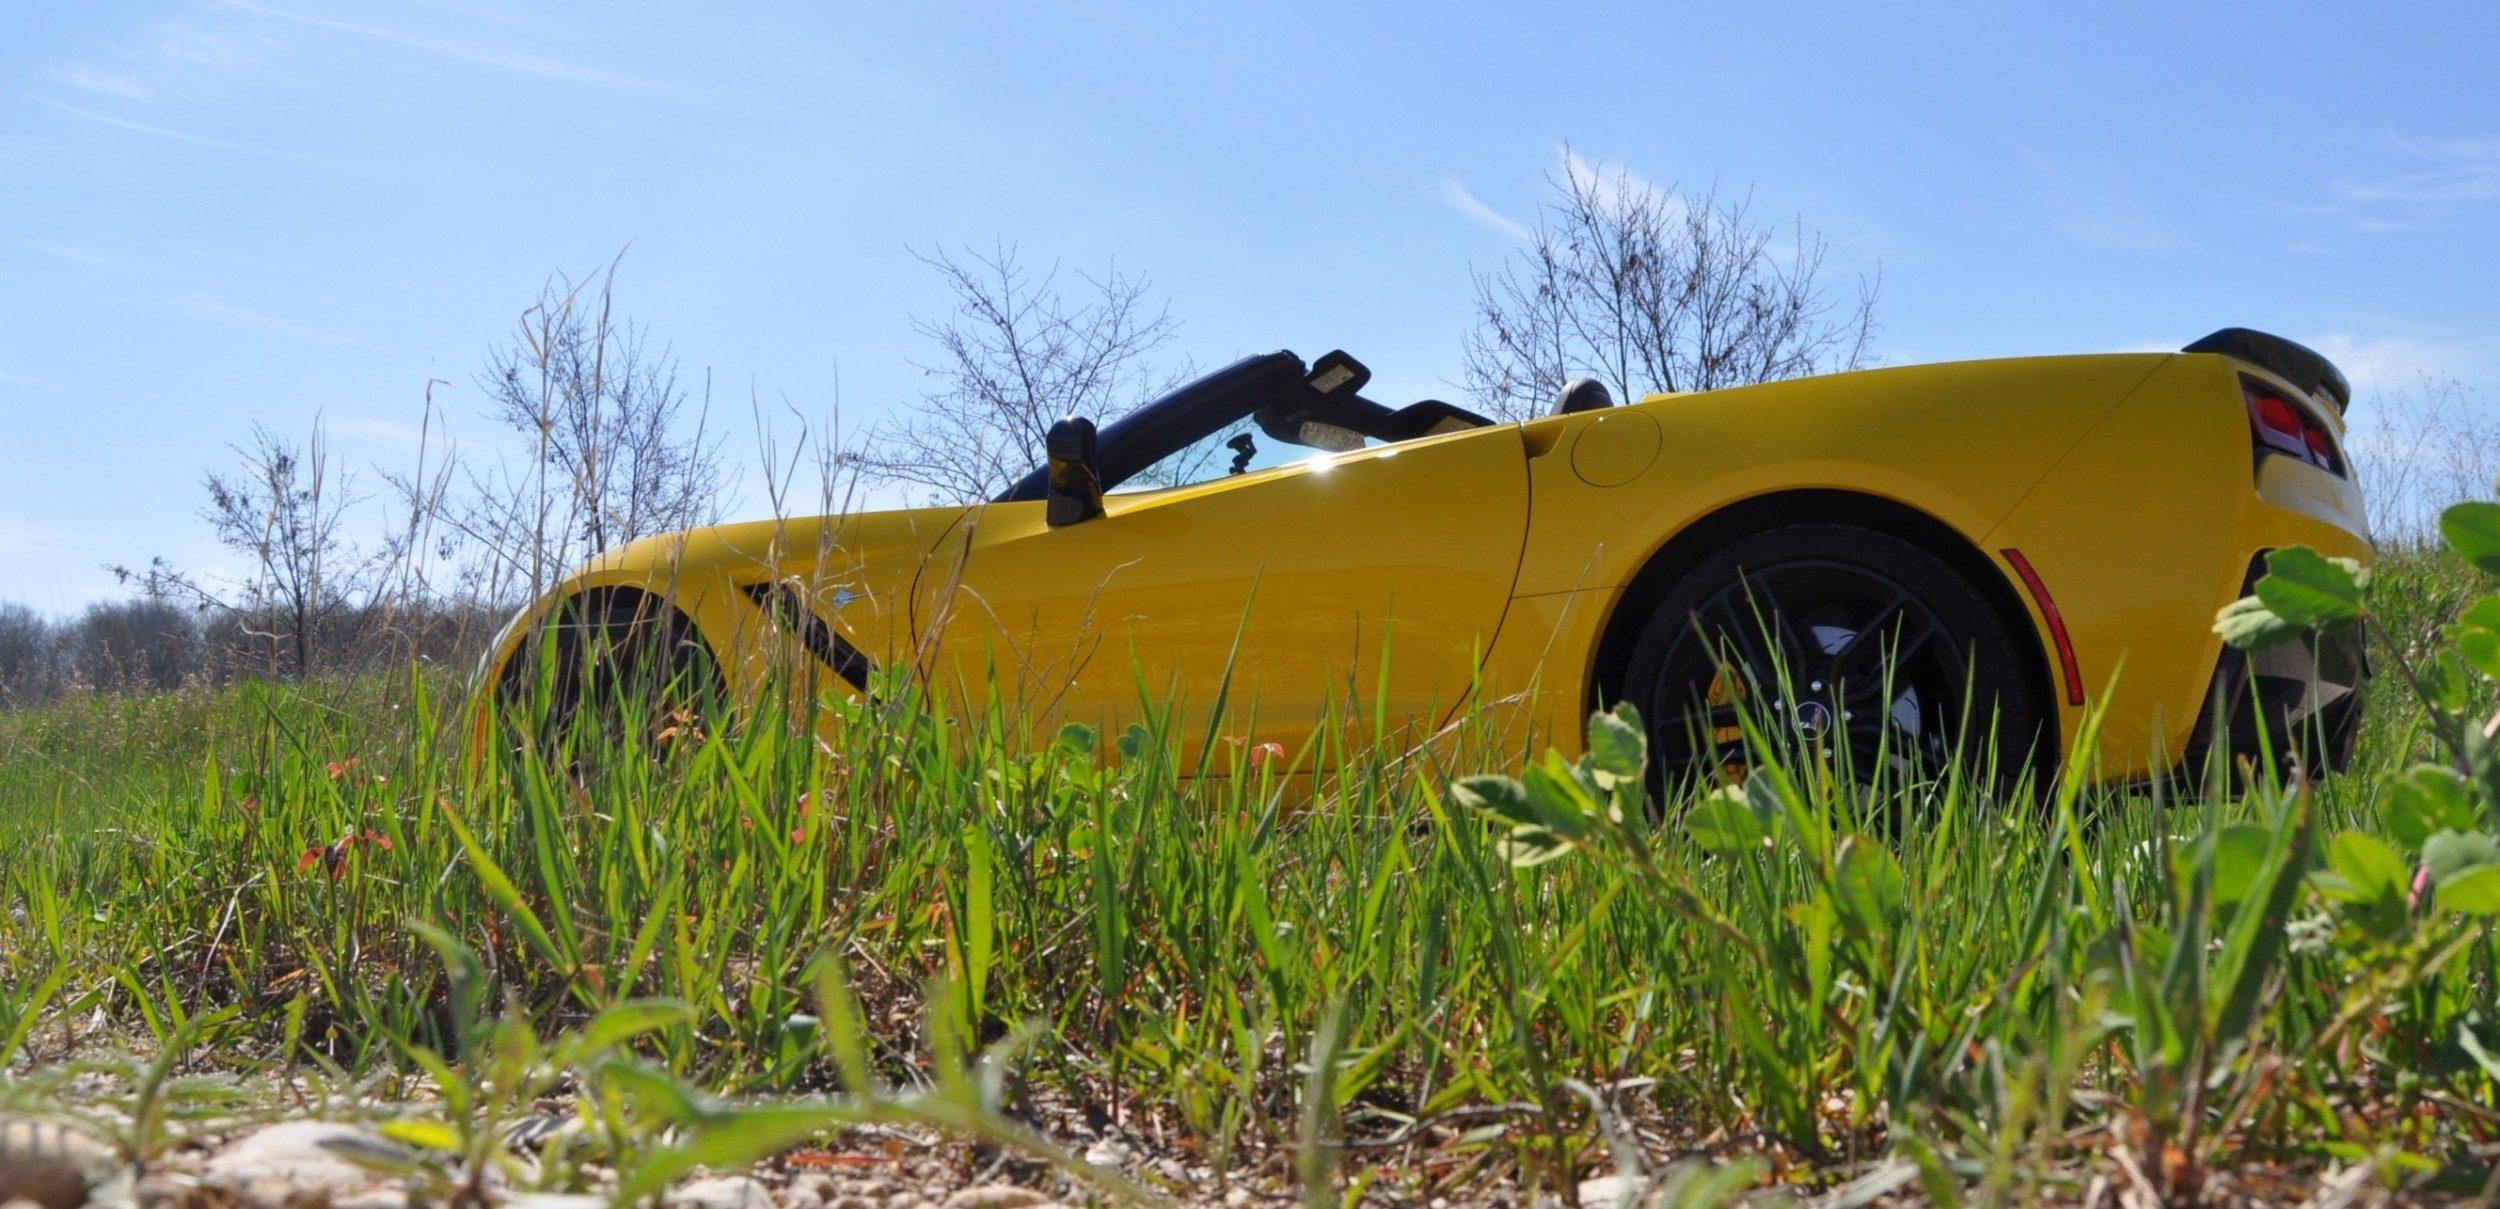 build your own corvette autos post. Cars Review. Best American Auto & Cars Review